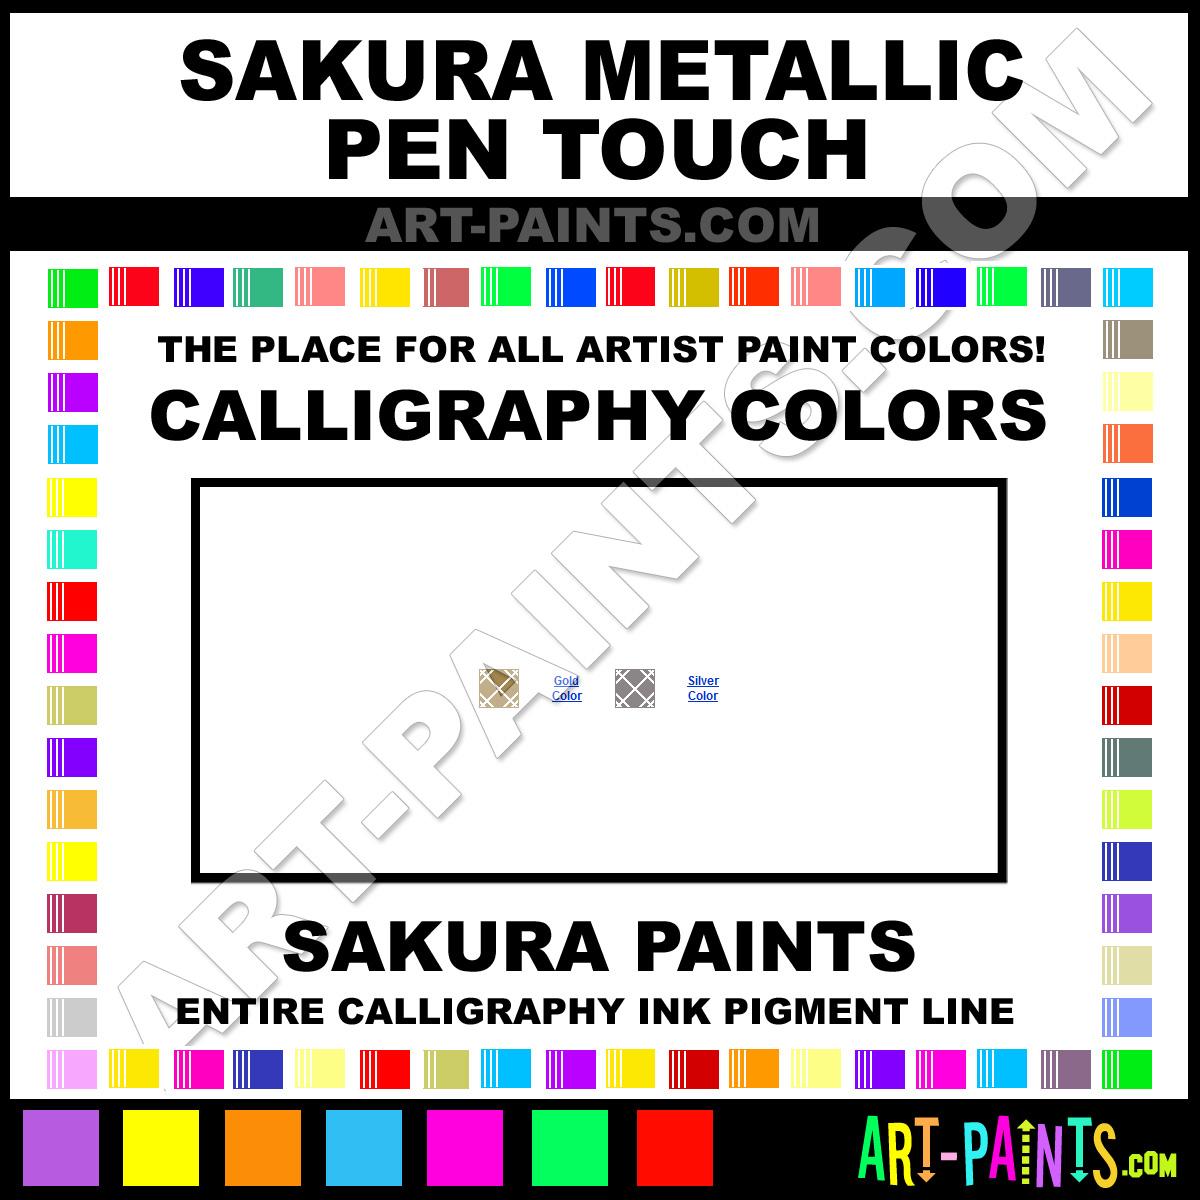 Sakura Metallic Pen Touch Calligraphy Ink Pigment Colors